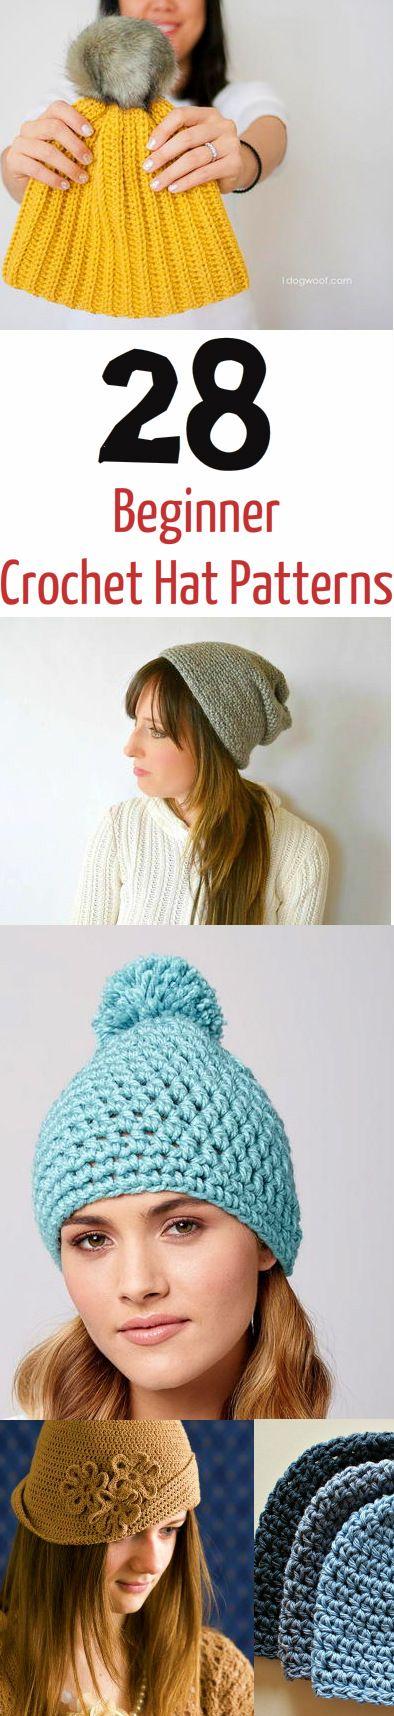 50 Beginner Crochet Hat Patterns   Gorros, Tejido y Ganchillo